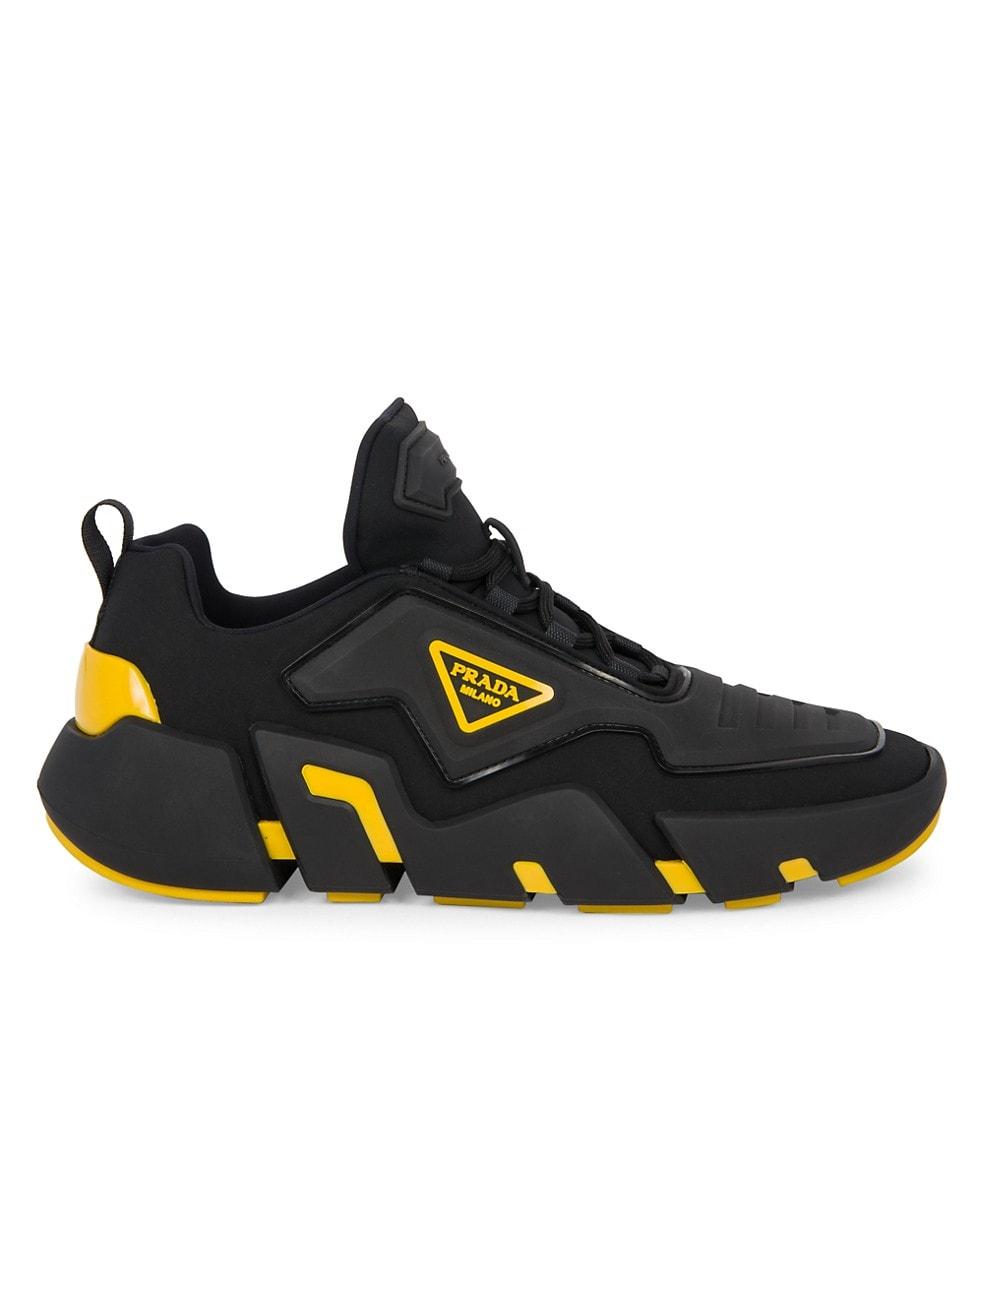 Prada The Techno Stretch Sneakers